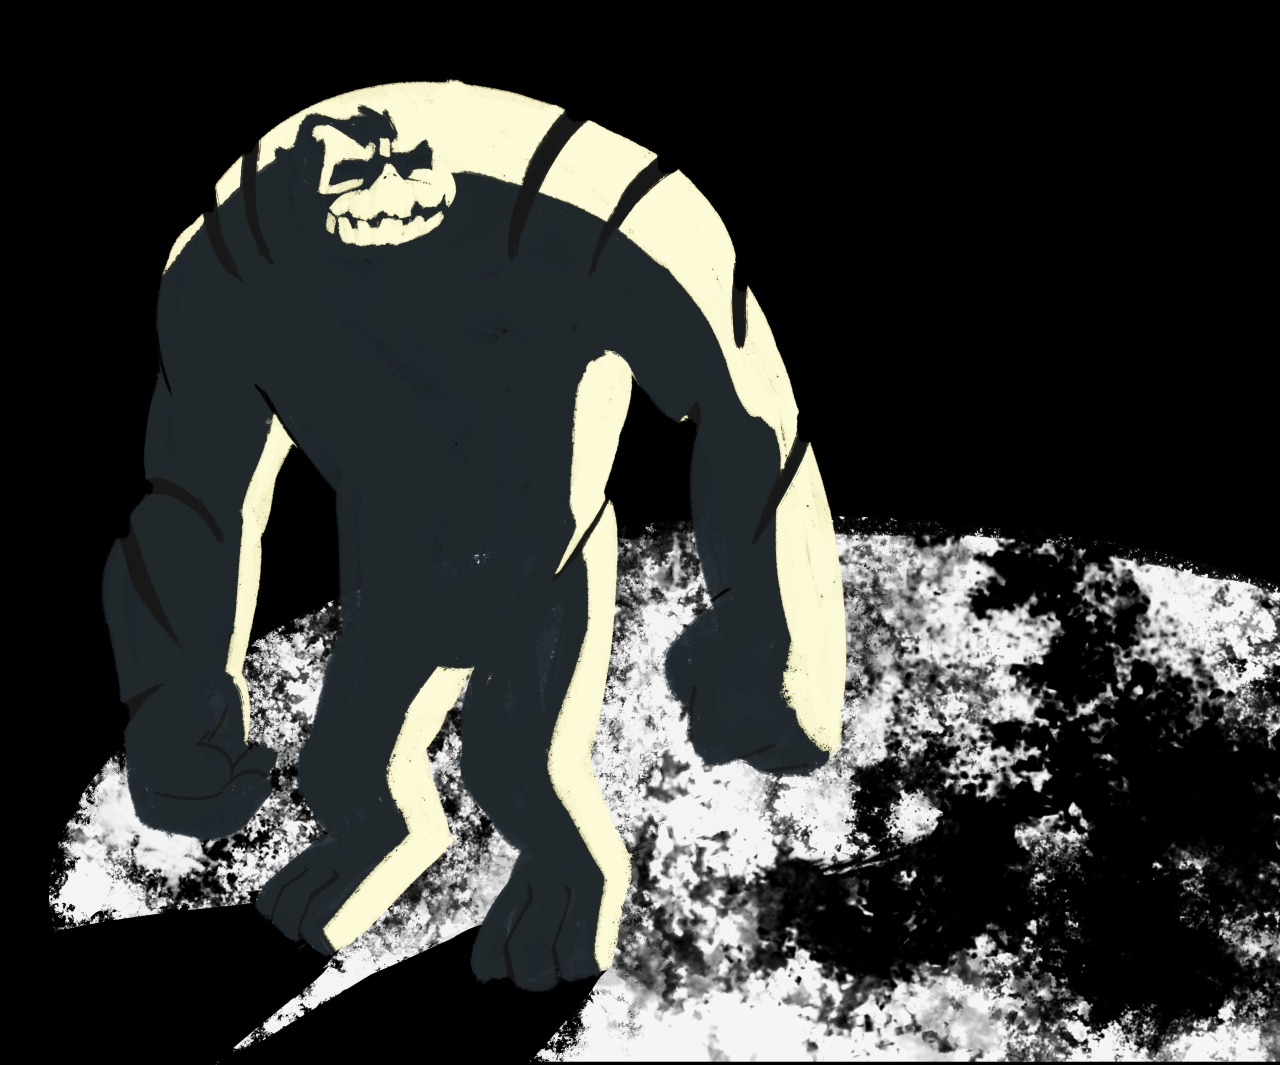 Igoo the stone Ape